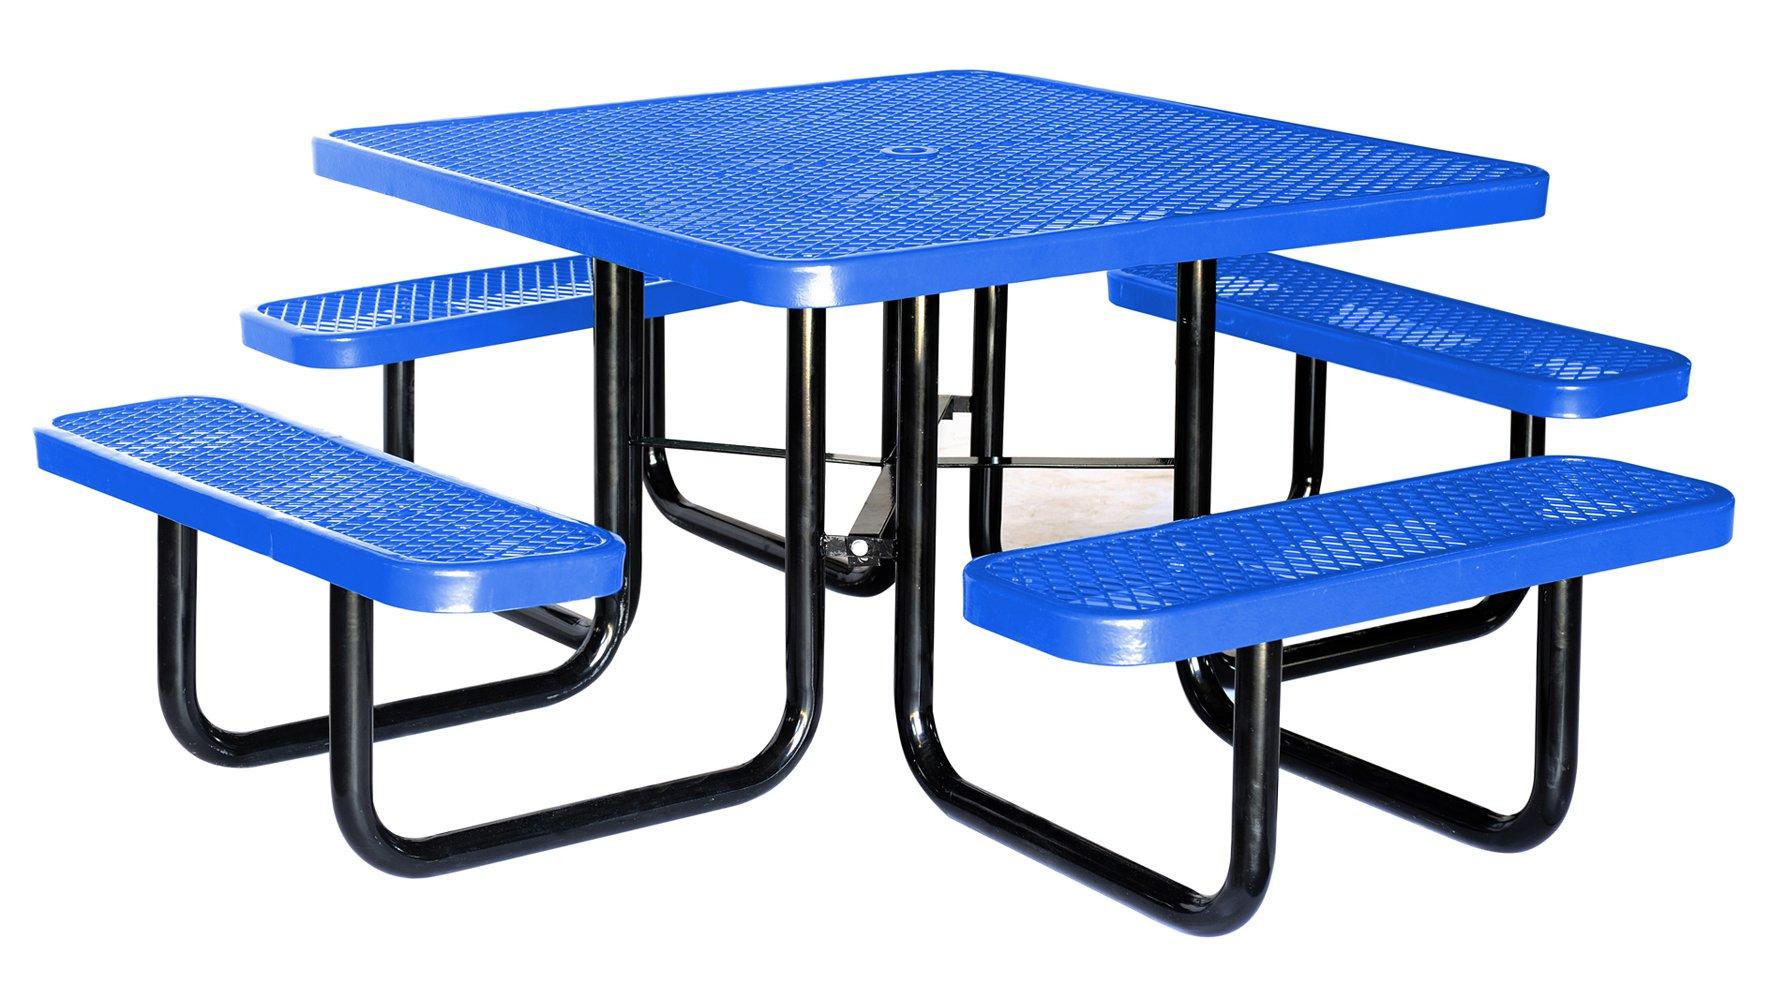 Lifeyard 46'' Expanded Metal Square Picnic Table, Blue!